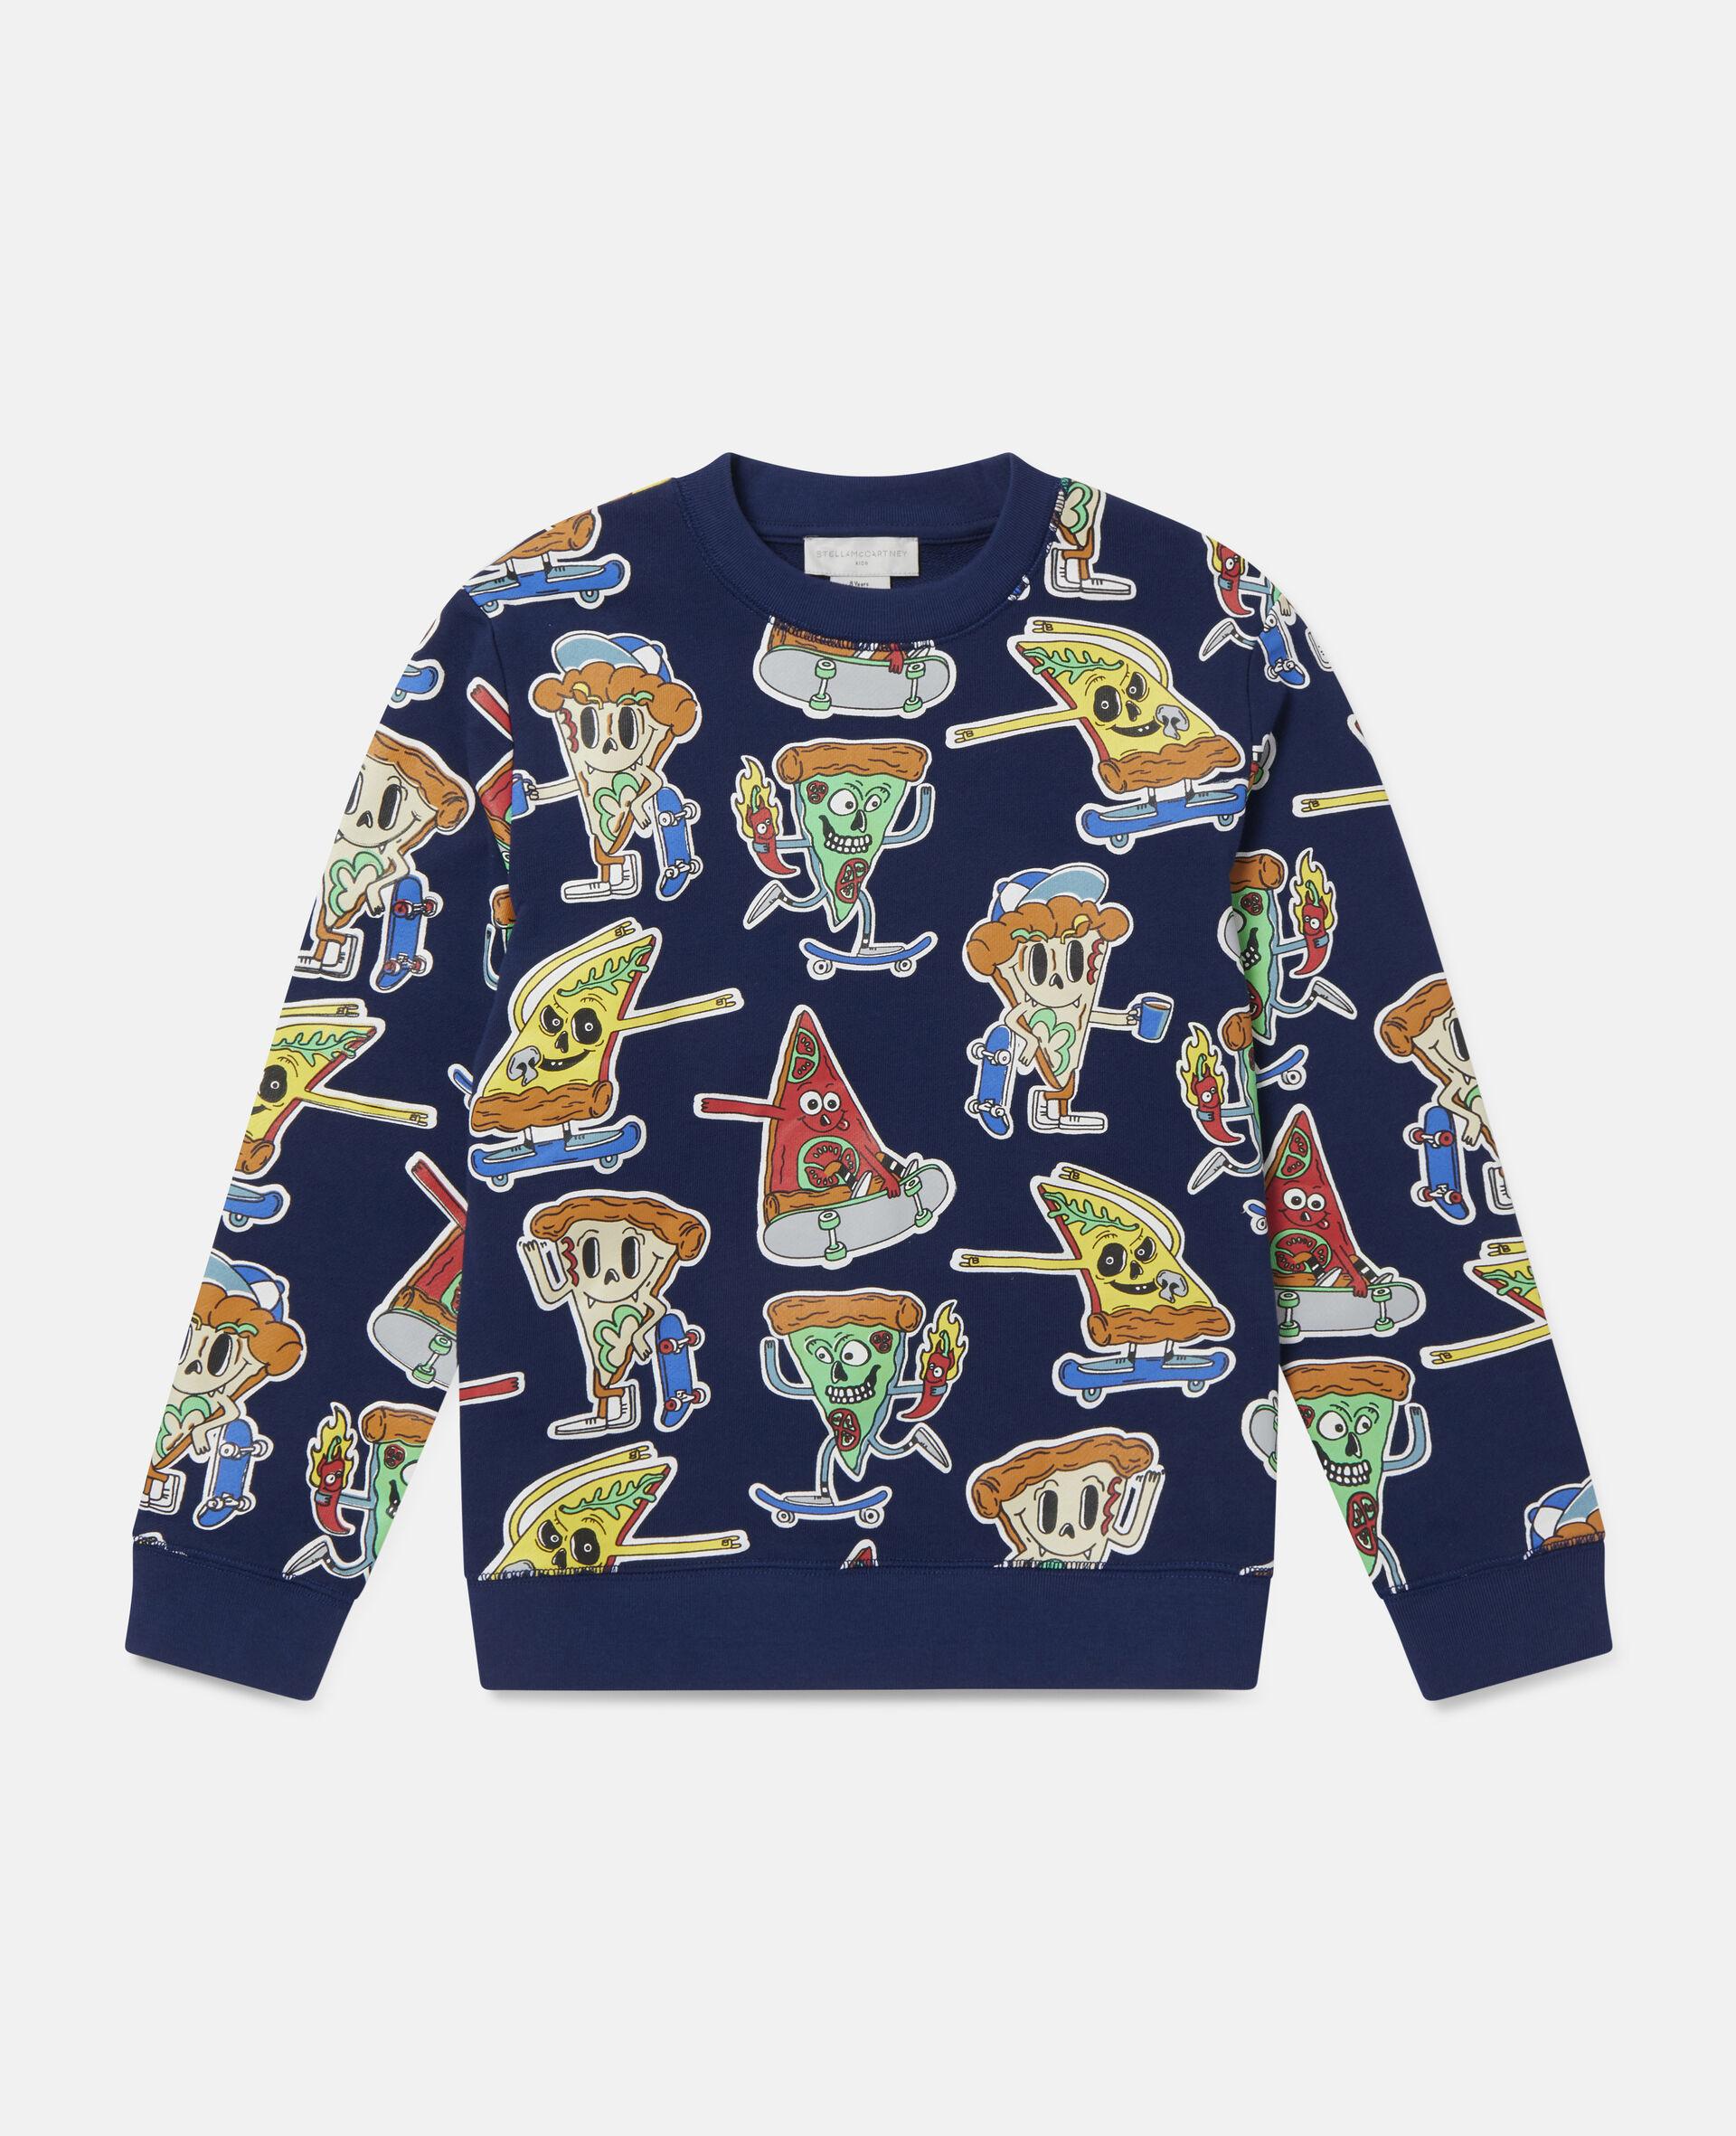 Fleece-Sweatshirt mit Pizza-Skater-Motiv-Blau-large image number 0